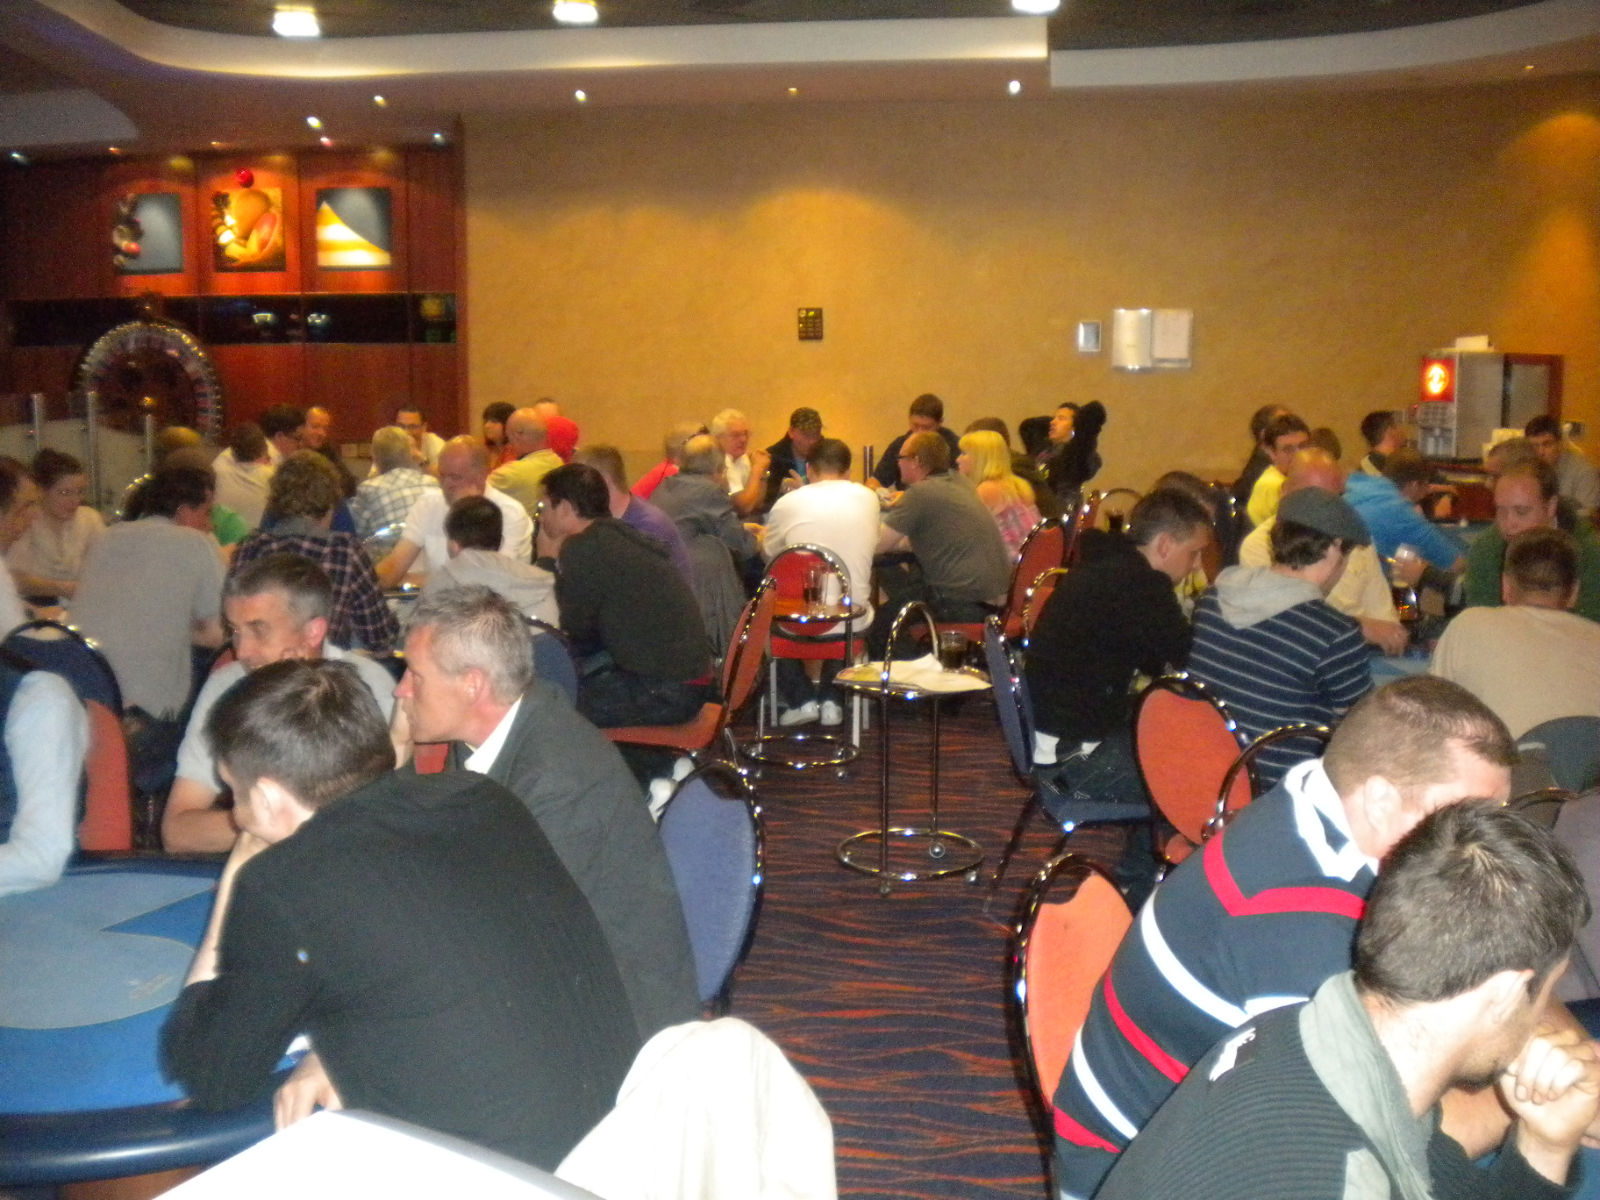 The nuts poker league regional finals